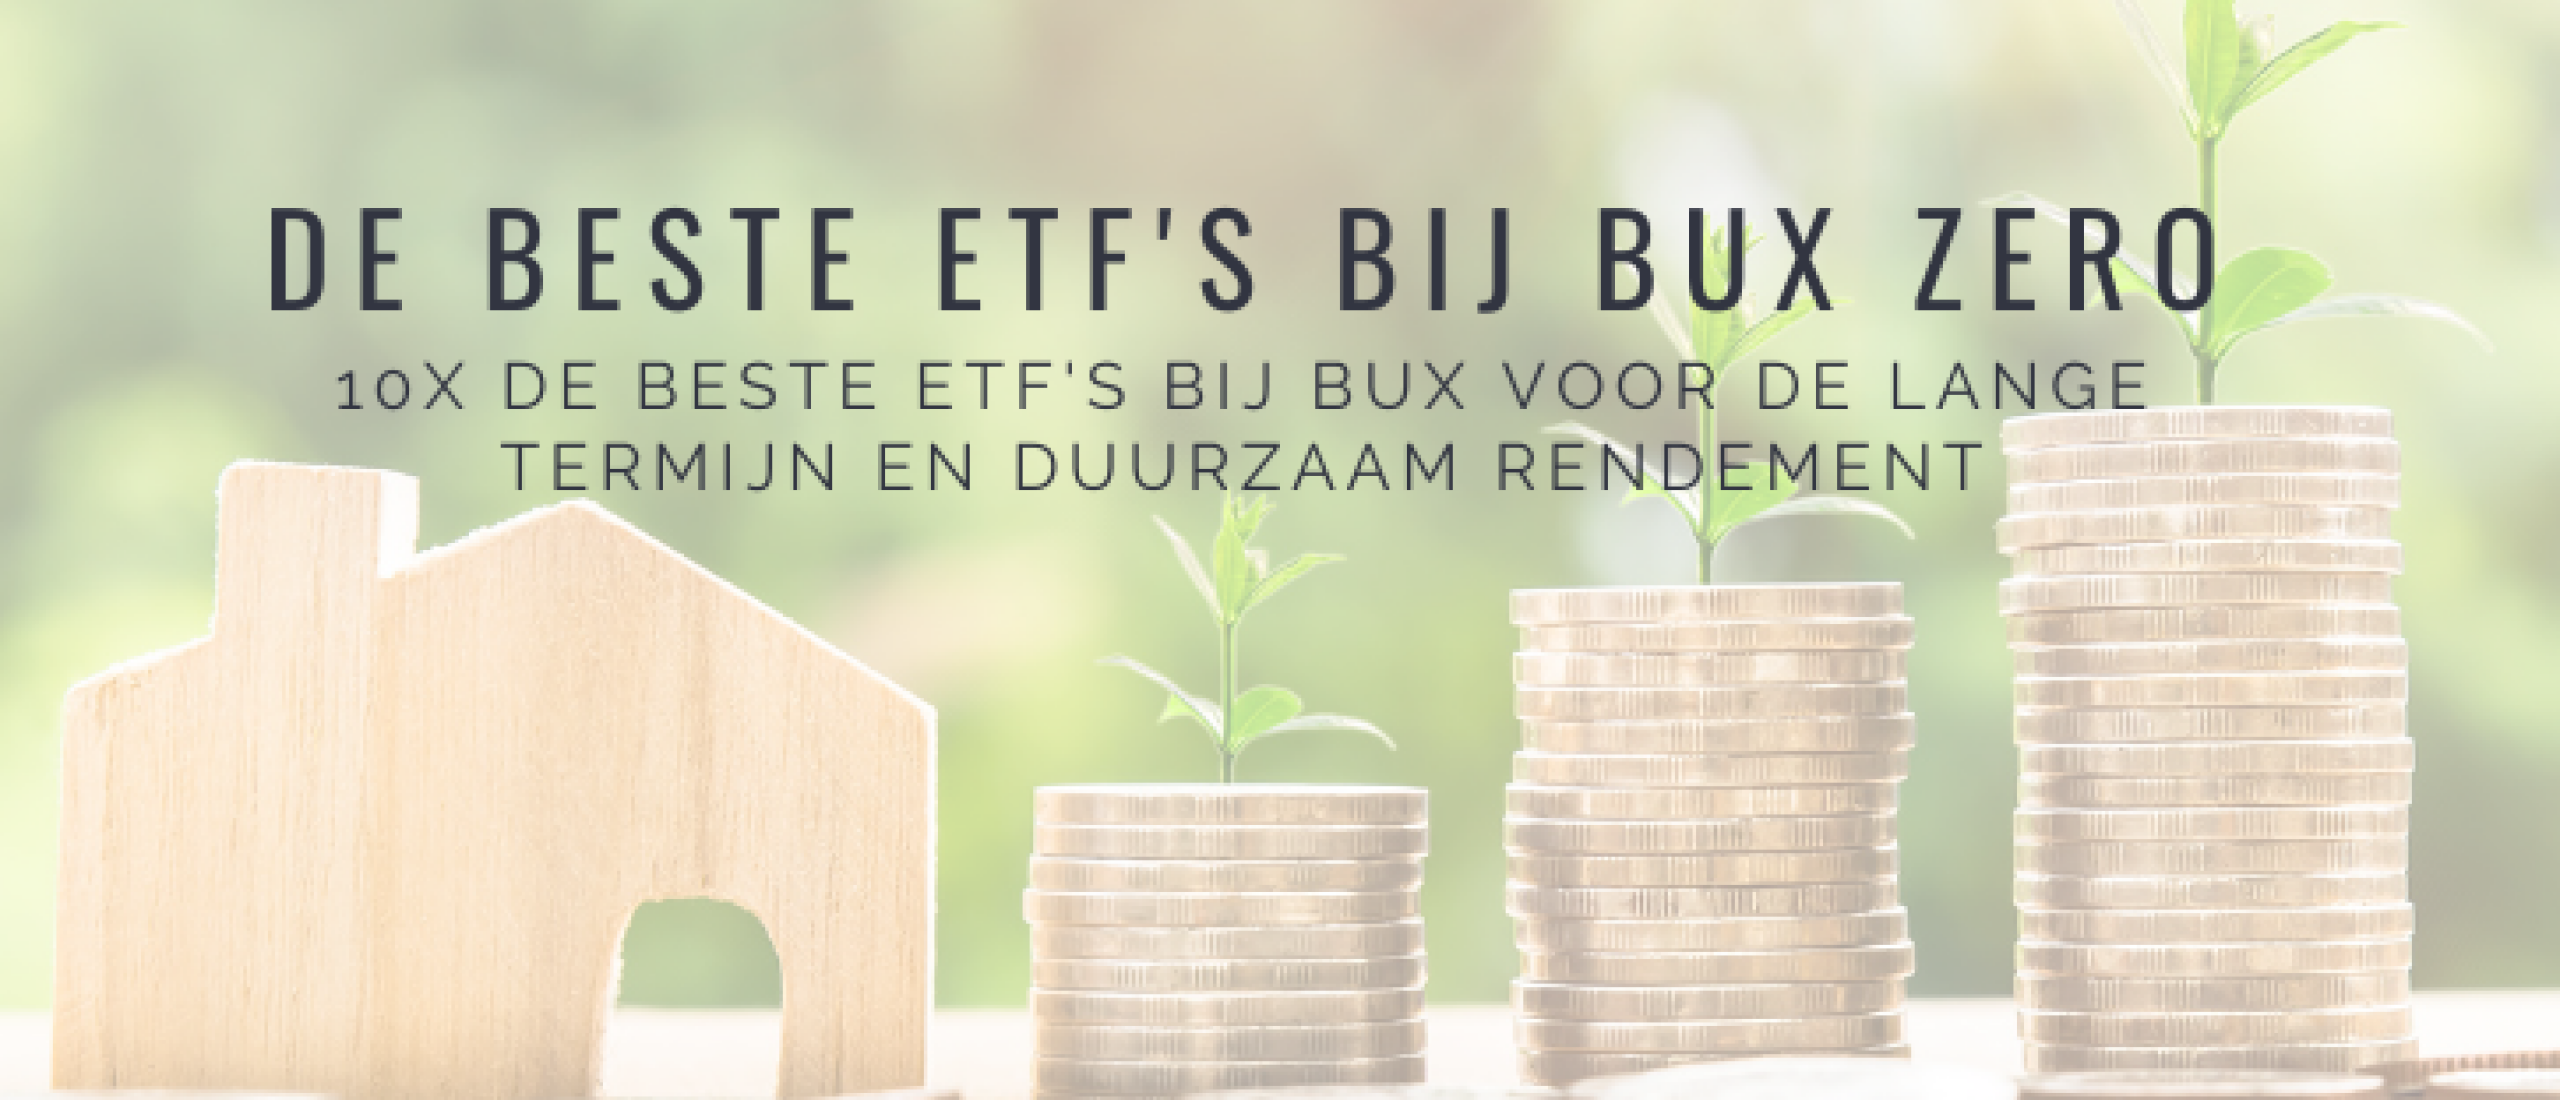 Welke ETF's Beleggen BUX Zero? 10x Beste ETF's Lange Termijn